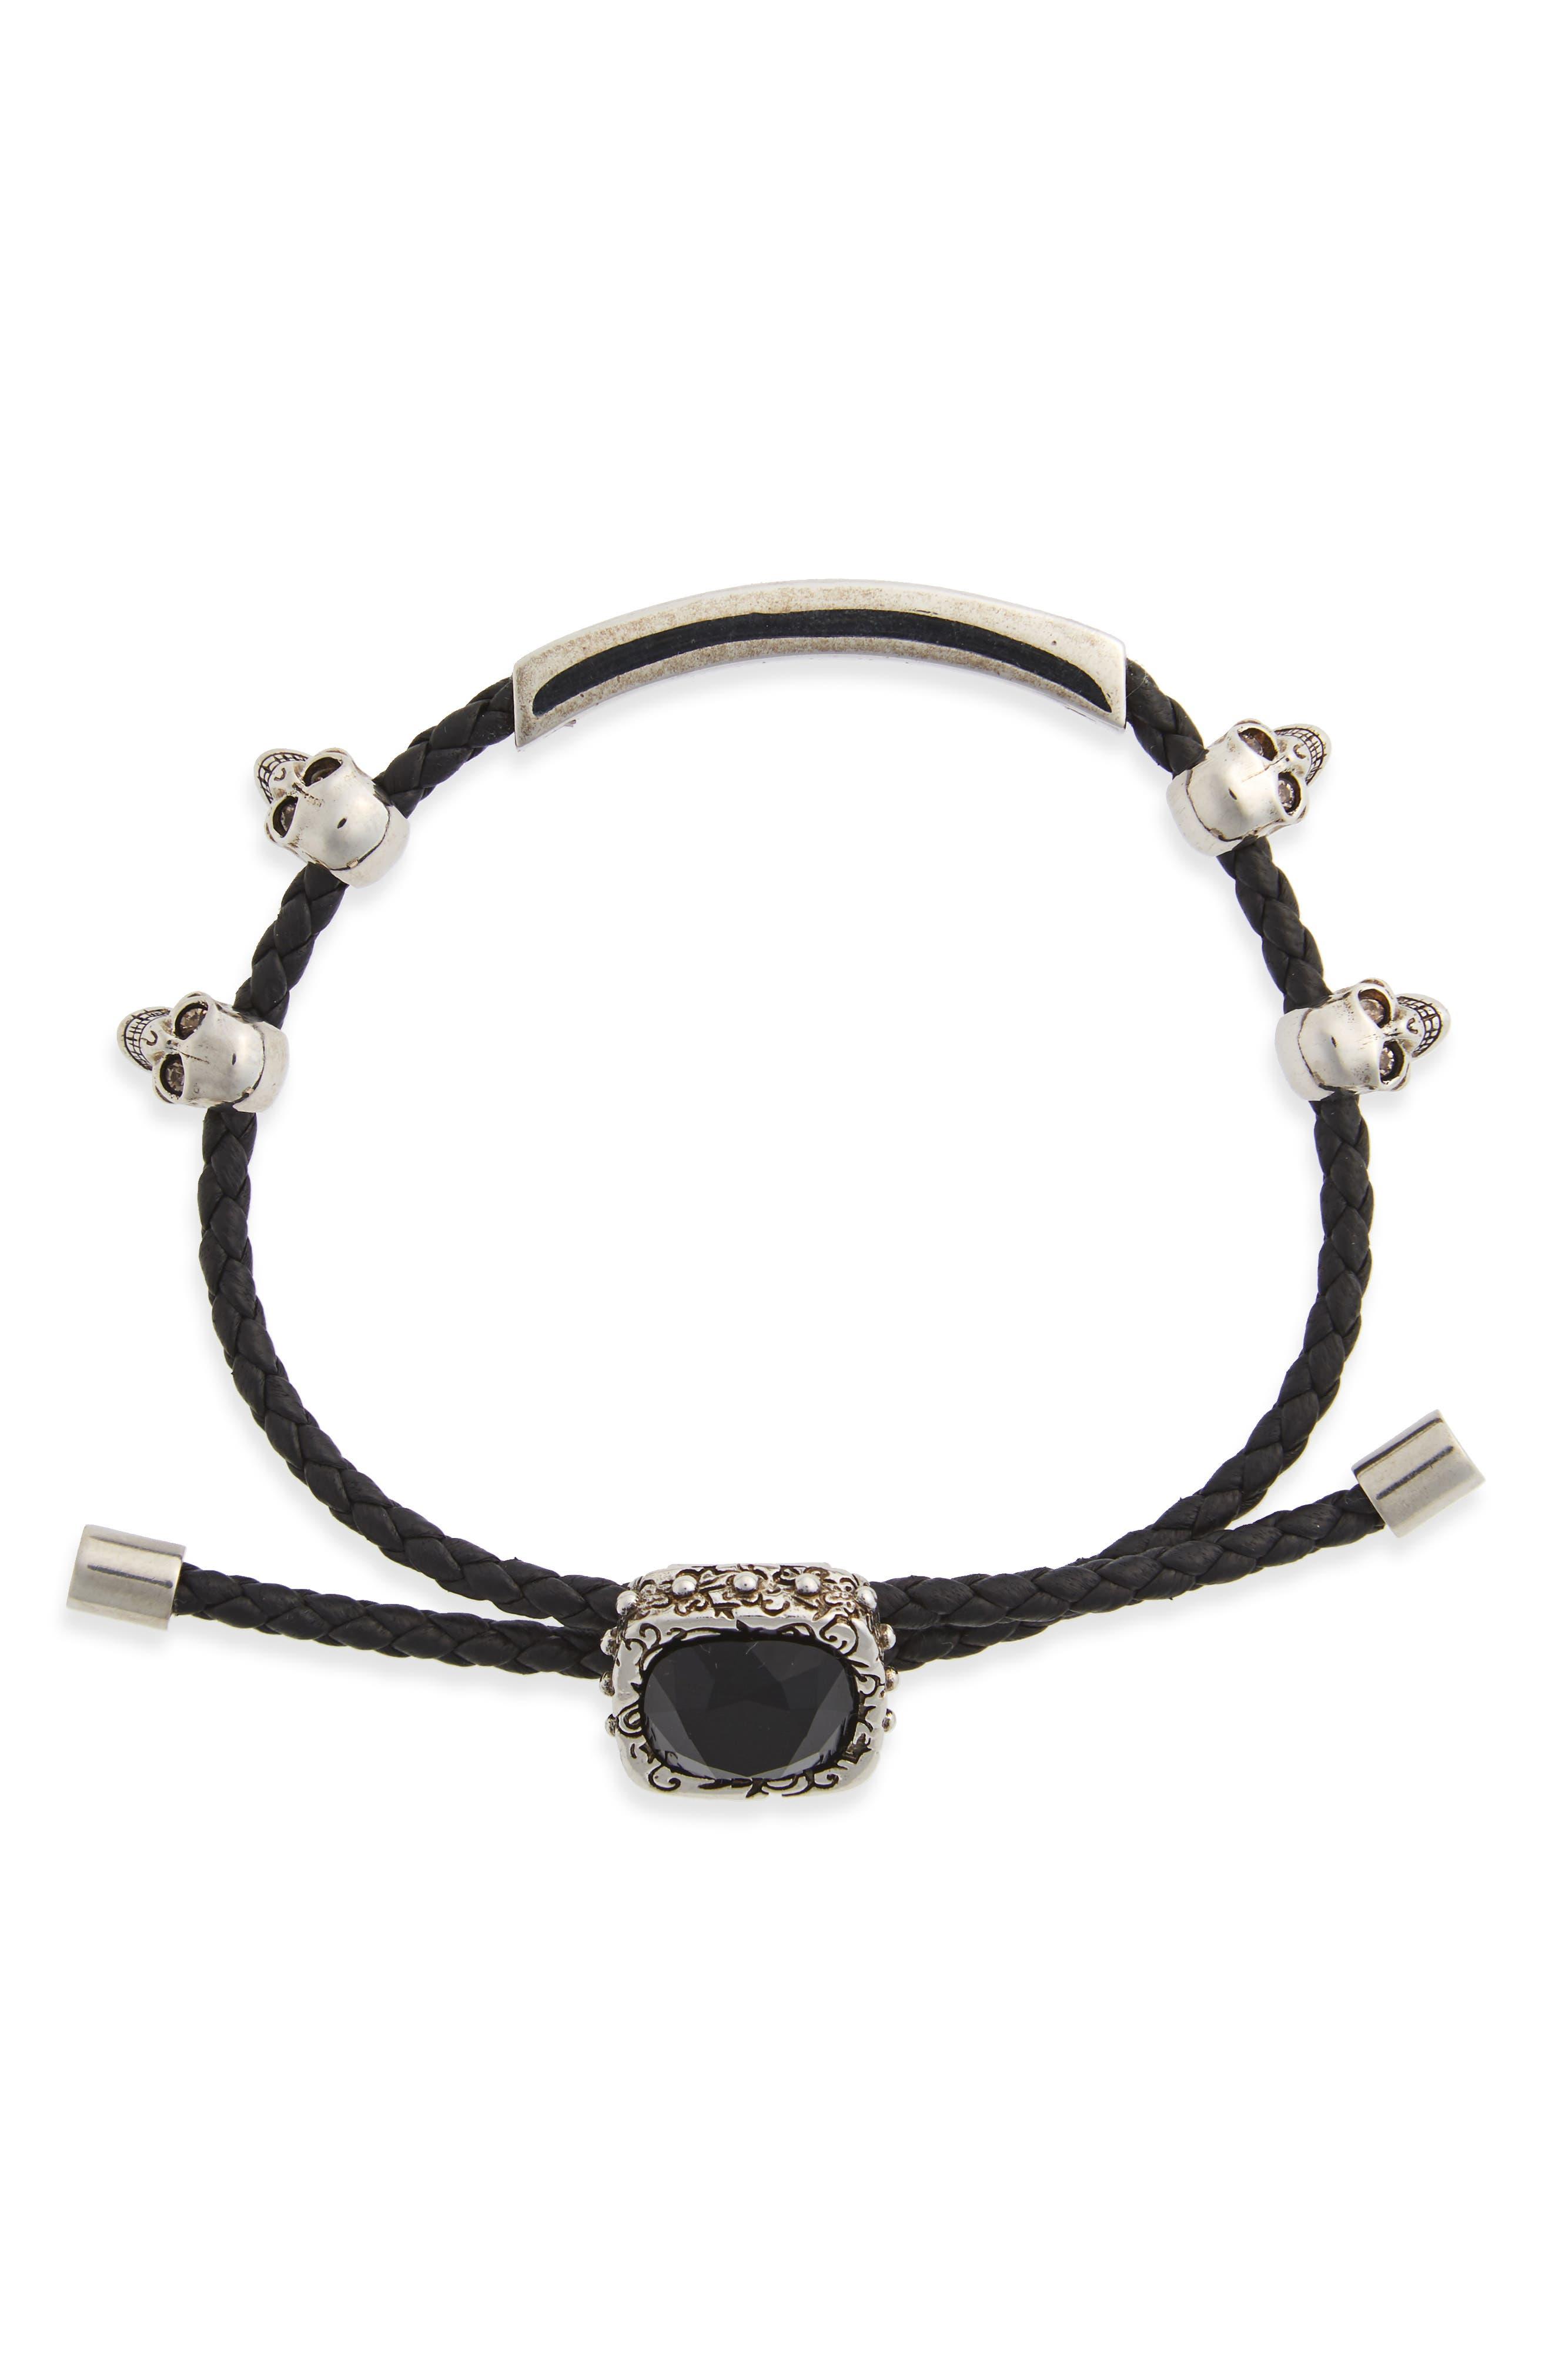 Jewel Friendship Bracelet,                             Main thumbnail 1, color,                             001